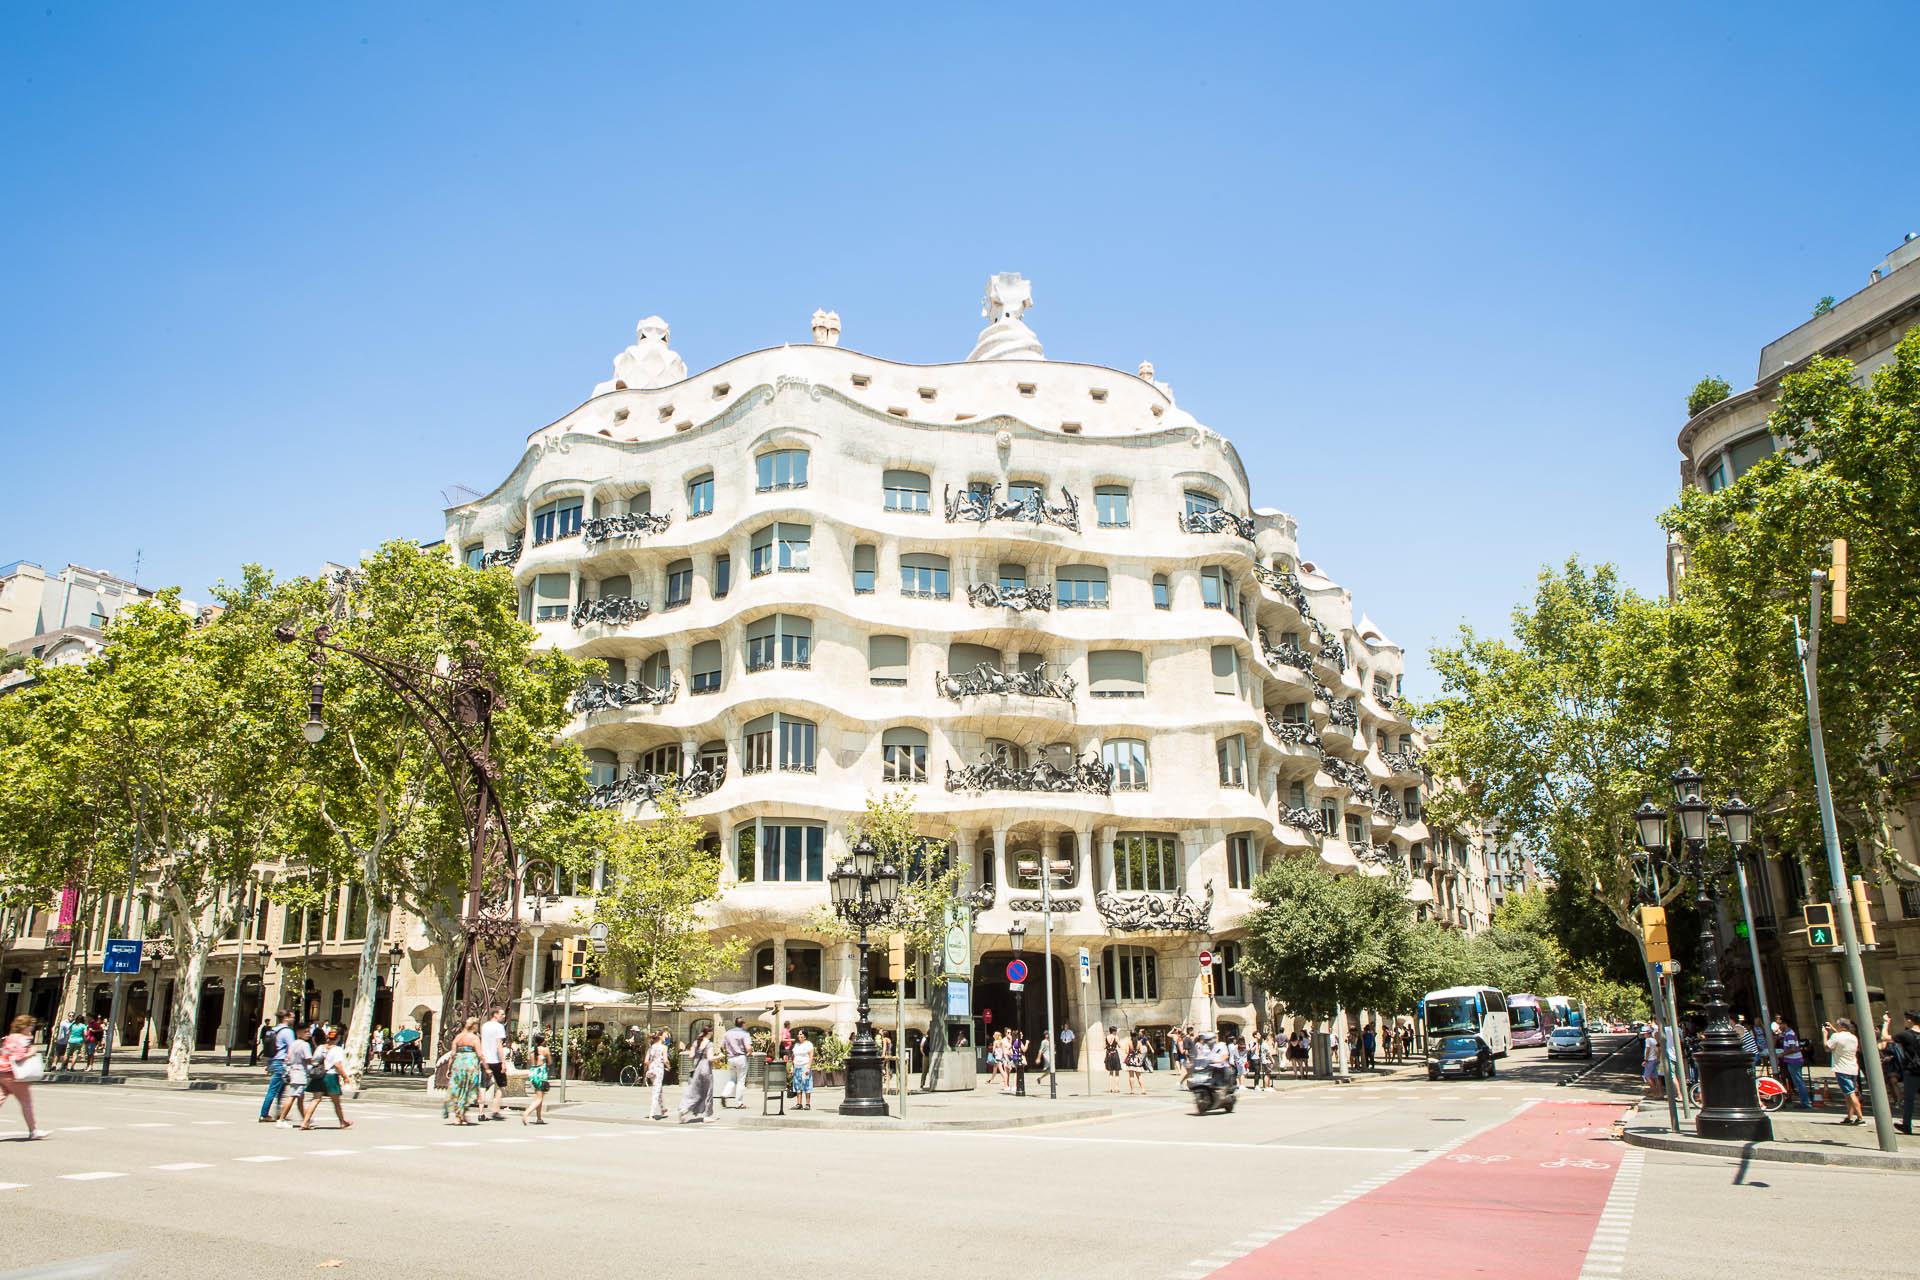 La Perdrera, chef-d'oeuvre de Gaudi